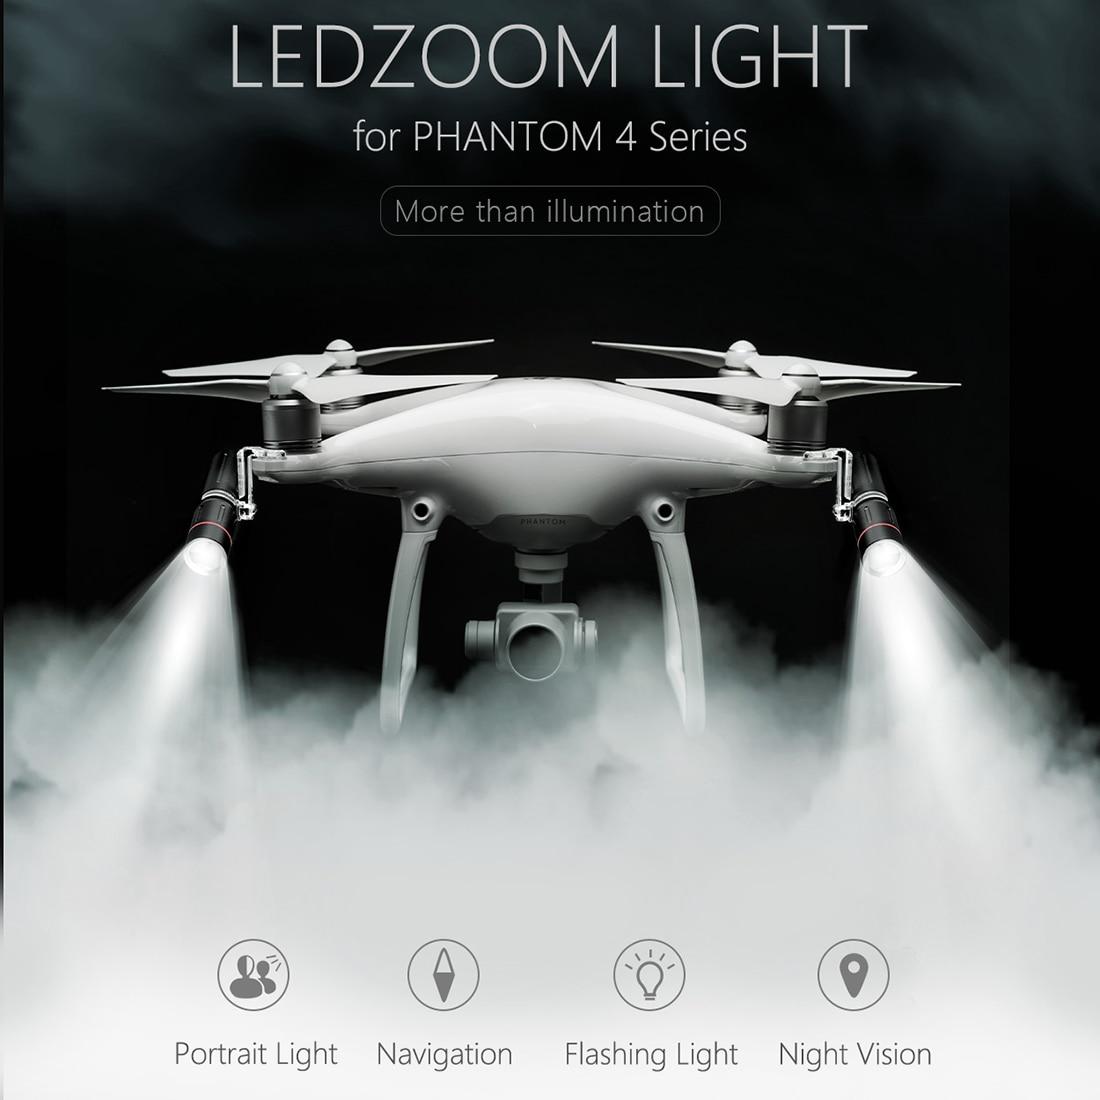 PGYTECH LED Zoom Light Navigation Lamp Headlight Spotlight for DJI Phantom 4/4 Pro/4 Pro+ Drone квадрокоптер dji phantom 4 pro с экраном